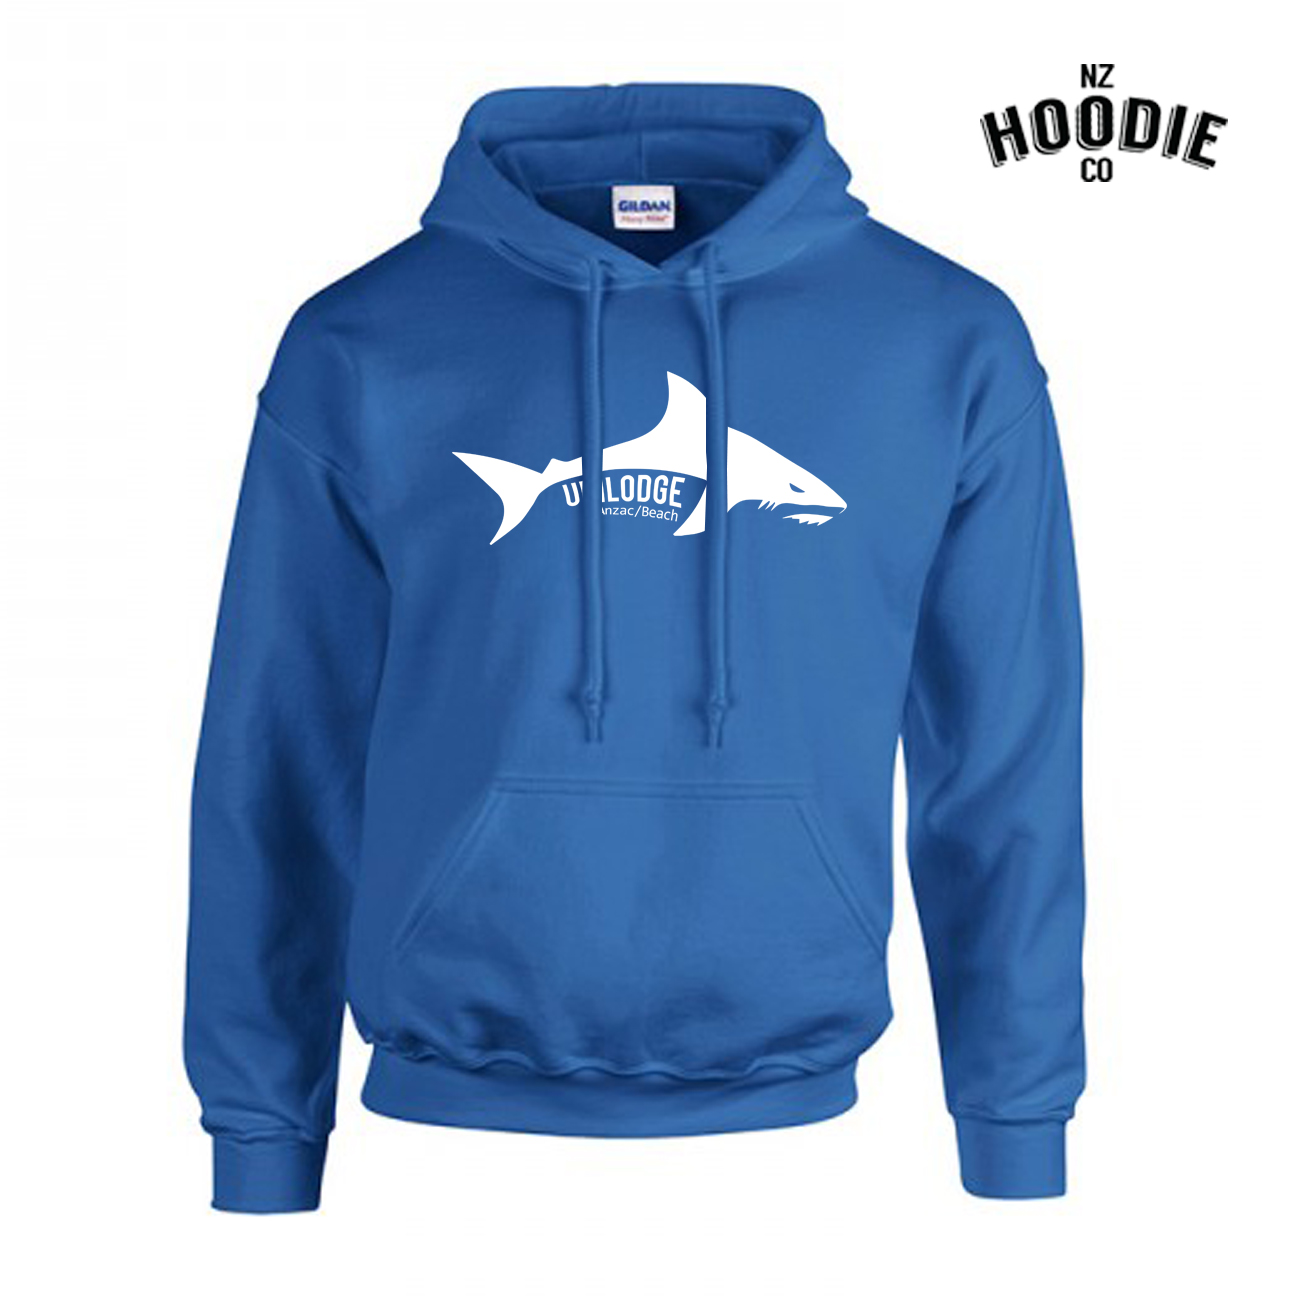 UniLodge Anzac Beach SHARK Gilden Hoodie FRONT (1).jpg